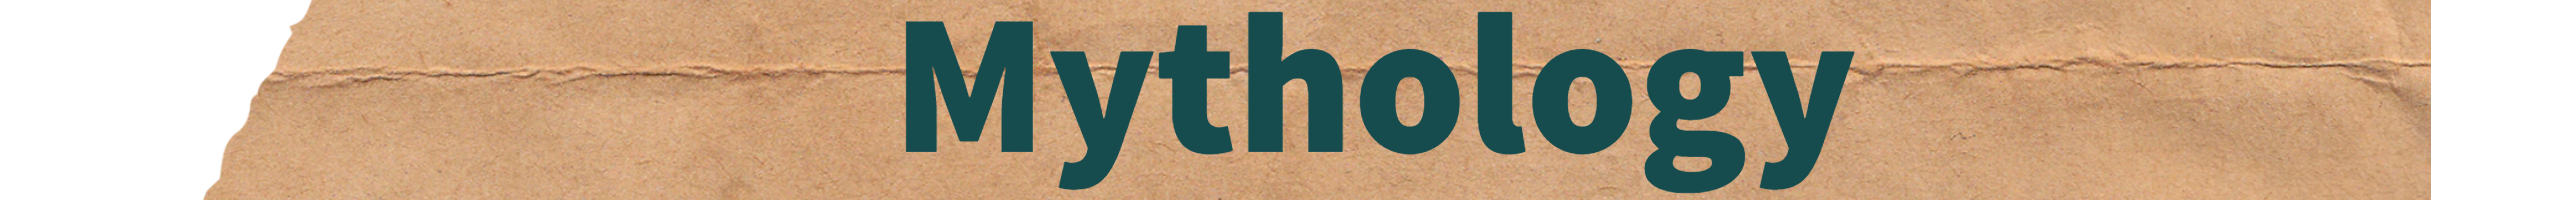 mythology banner